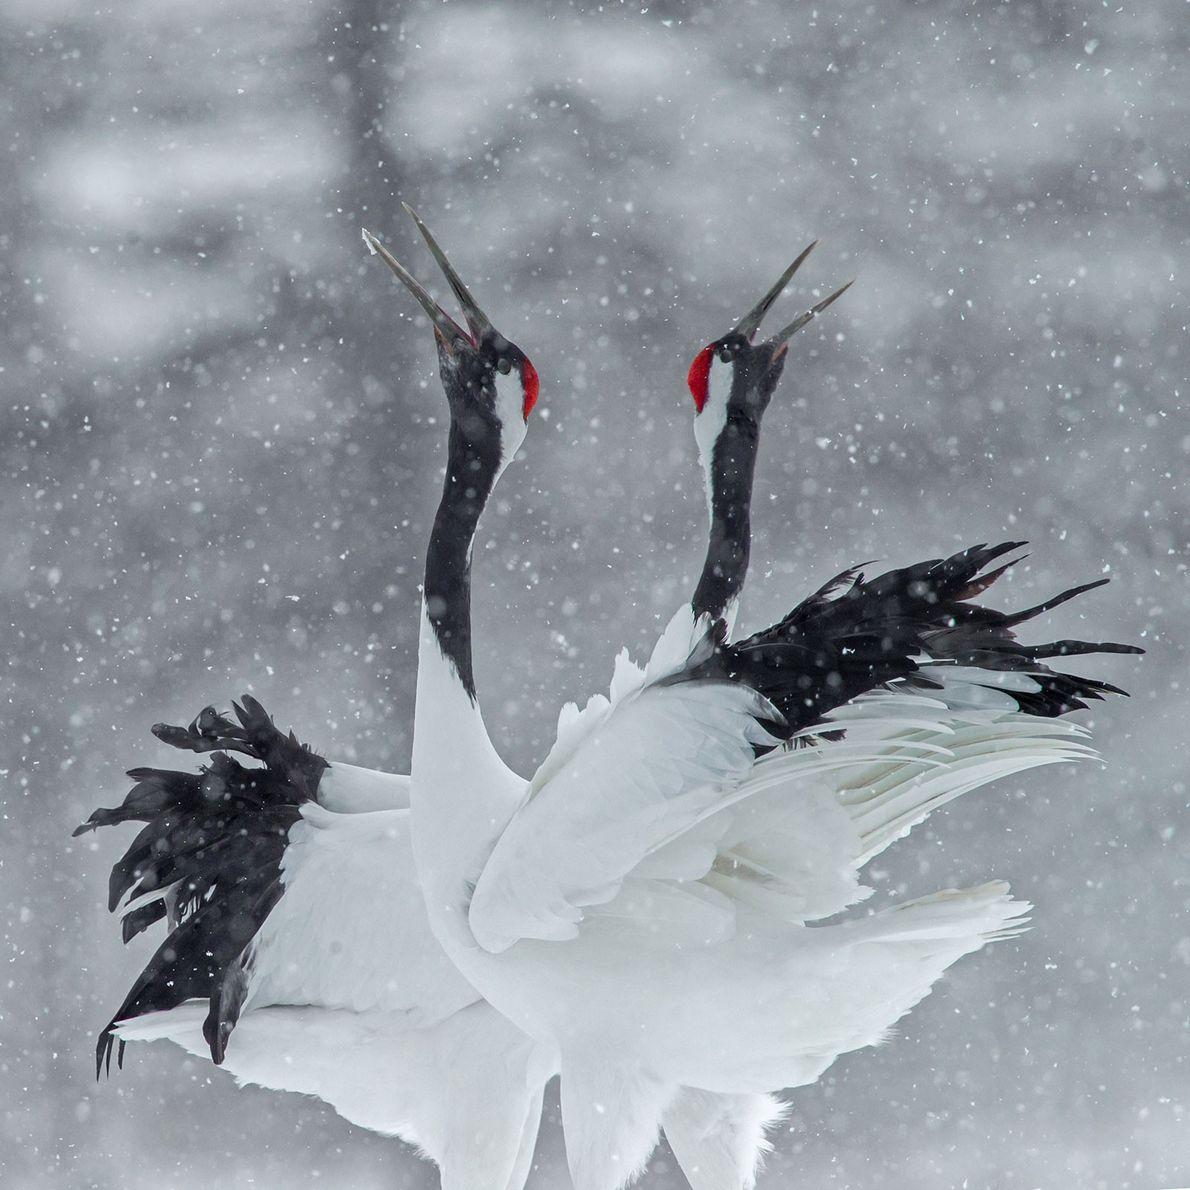 Grous-de-coroa-vermelha. Kushiro, Hokkaido, Japão